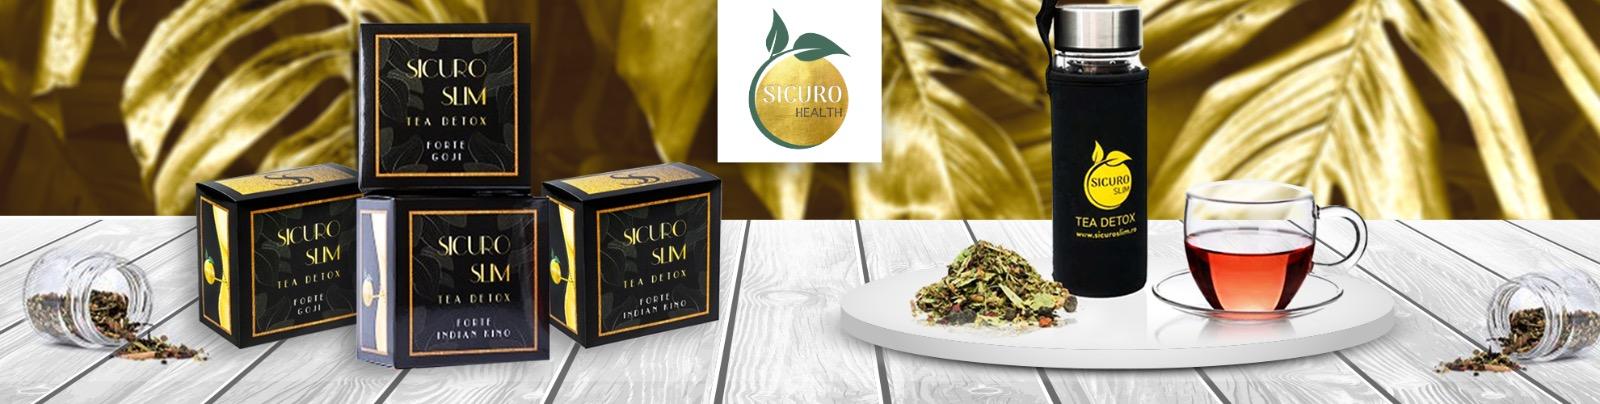 Sicuro Slim ceai detoxifiant